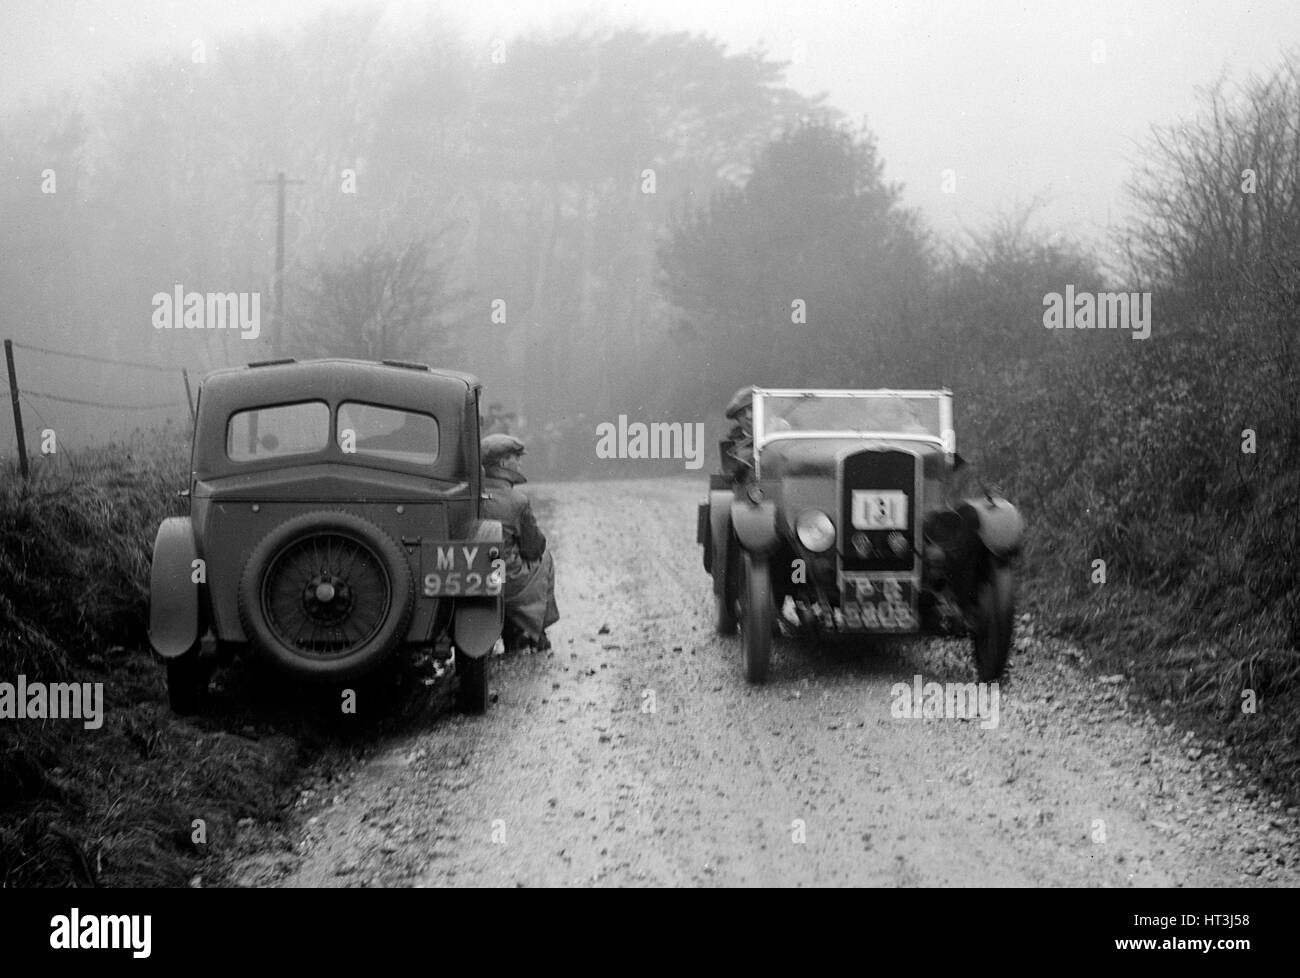 Triumph of J Cramer-Parry passing an official's Riley, MCC Exeter Trial, Blackhill, Dorset, 1930. Artist: Bill Brunell. Stock Photo